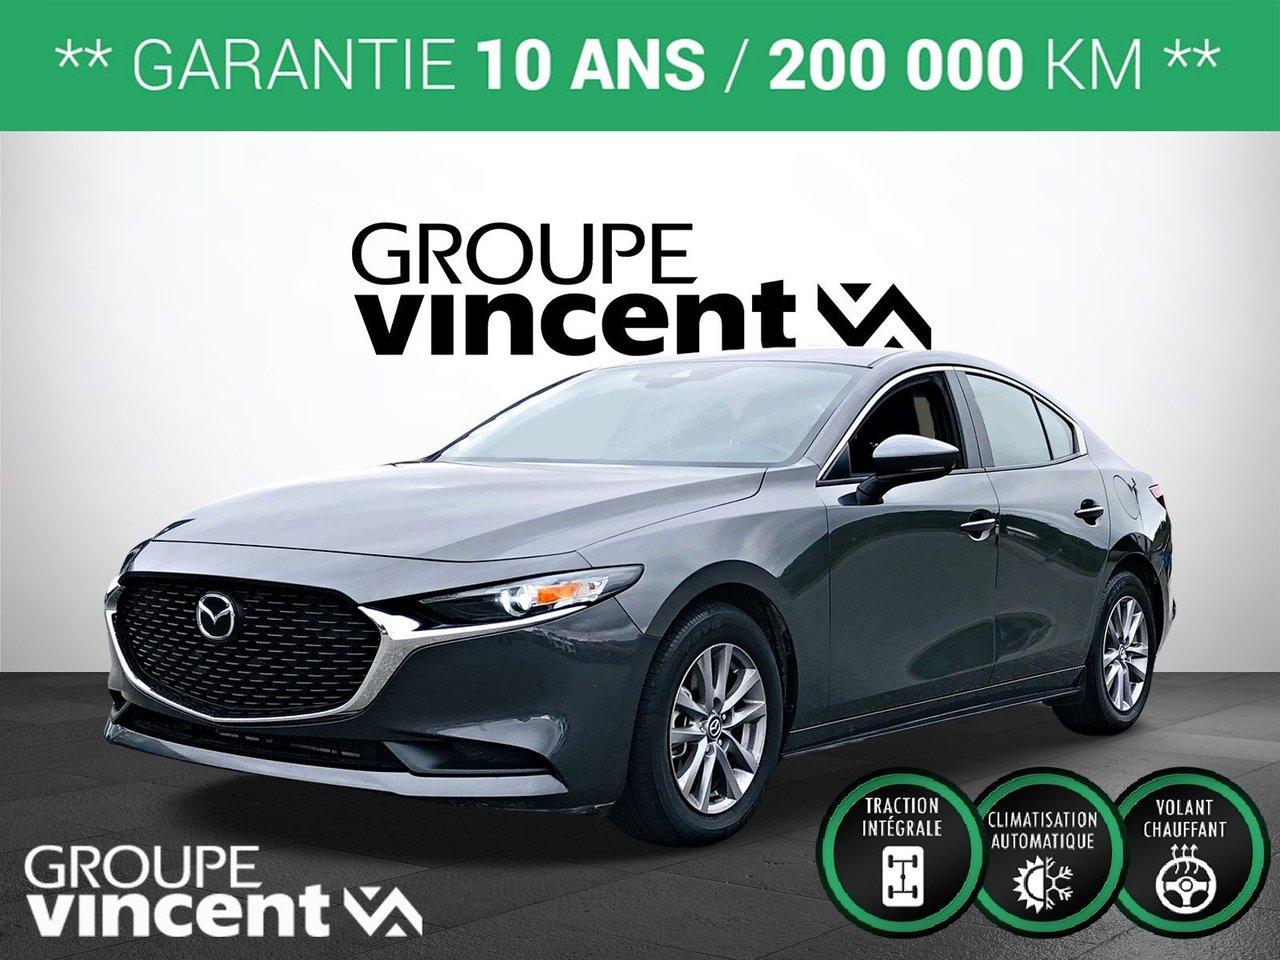 Mazda Mazda3 2021 GS AWD ** GARANTIE 10 ANS **